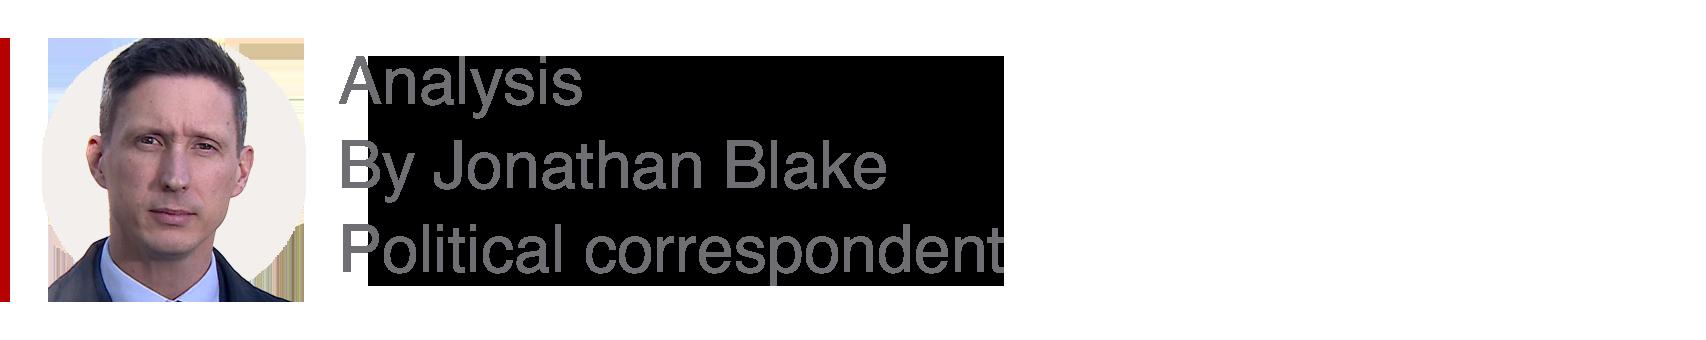 Analysis box by Jonathan Blake, political correspondent